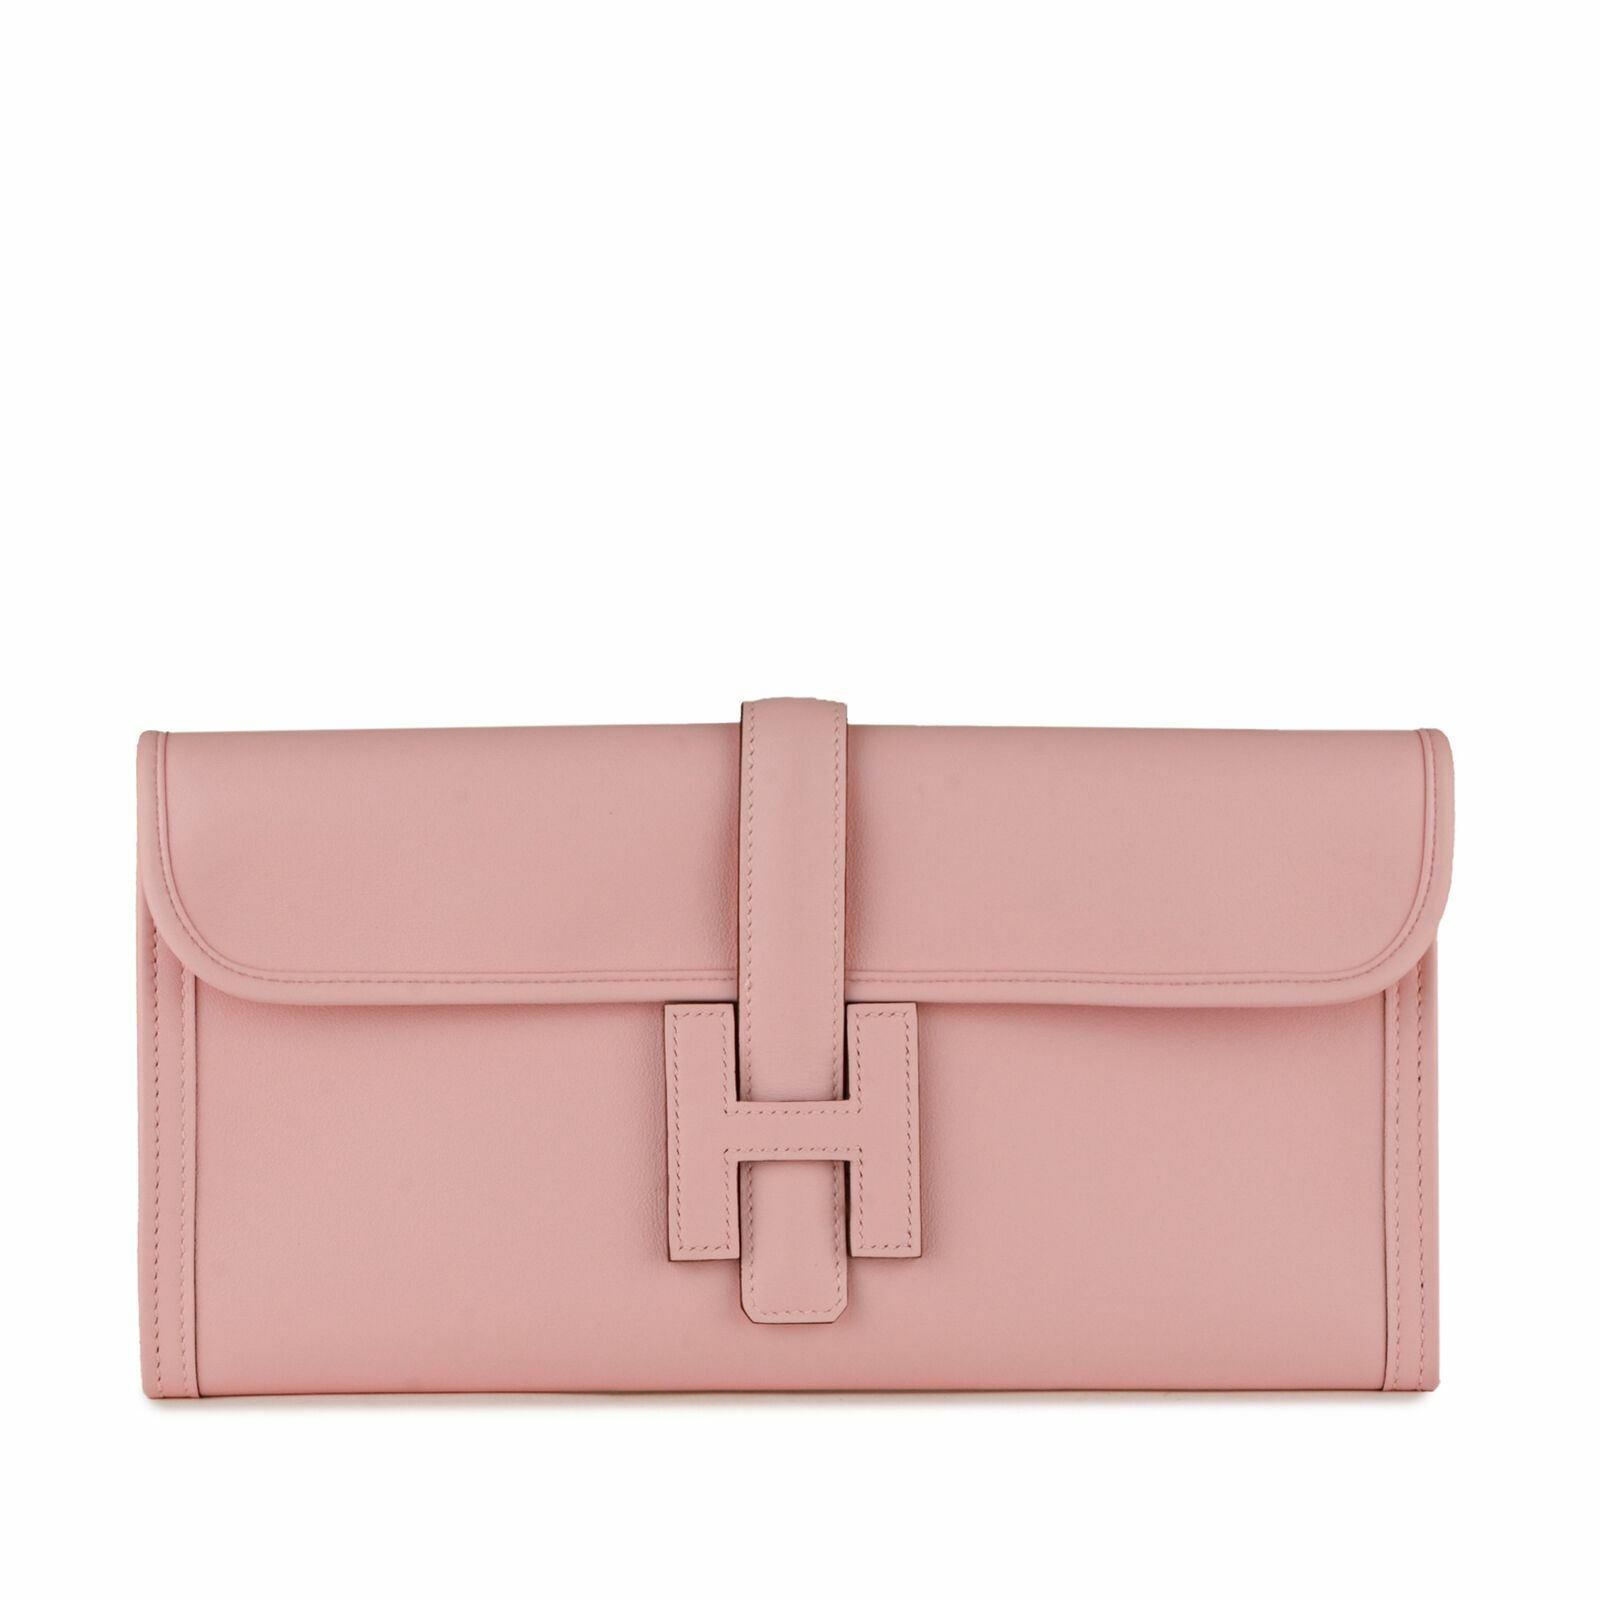 NEW 2019 Rare ROSE SAKURA Color HERMES Swift Jige Elan 29 Clutch Bag